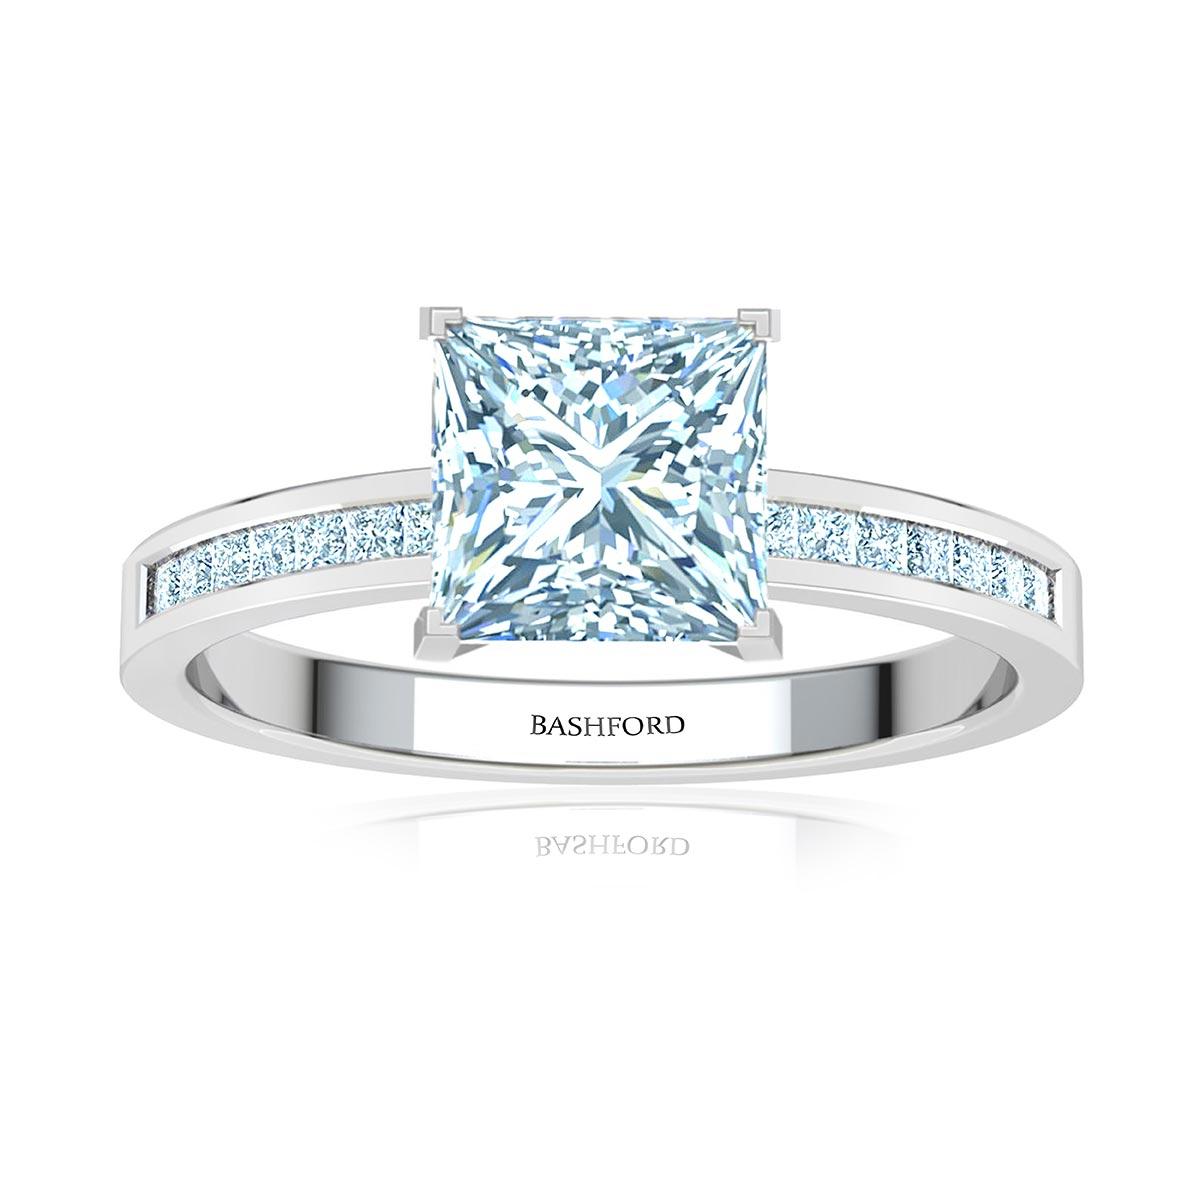 Ari Diamond Ring (with SI1, D, 1/2 Carat Princess Diamond)